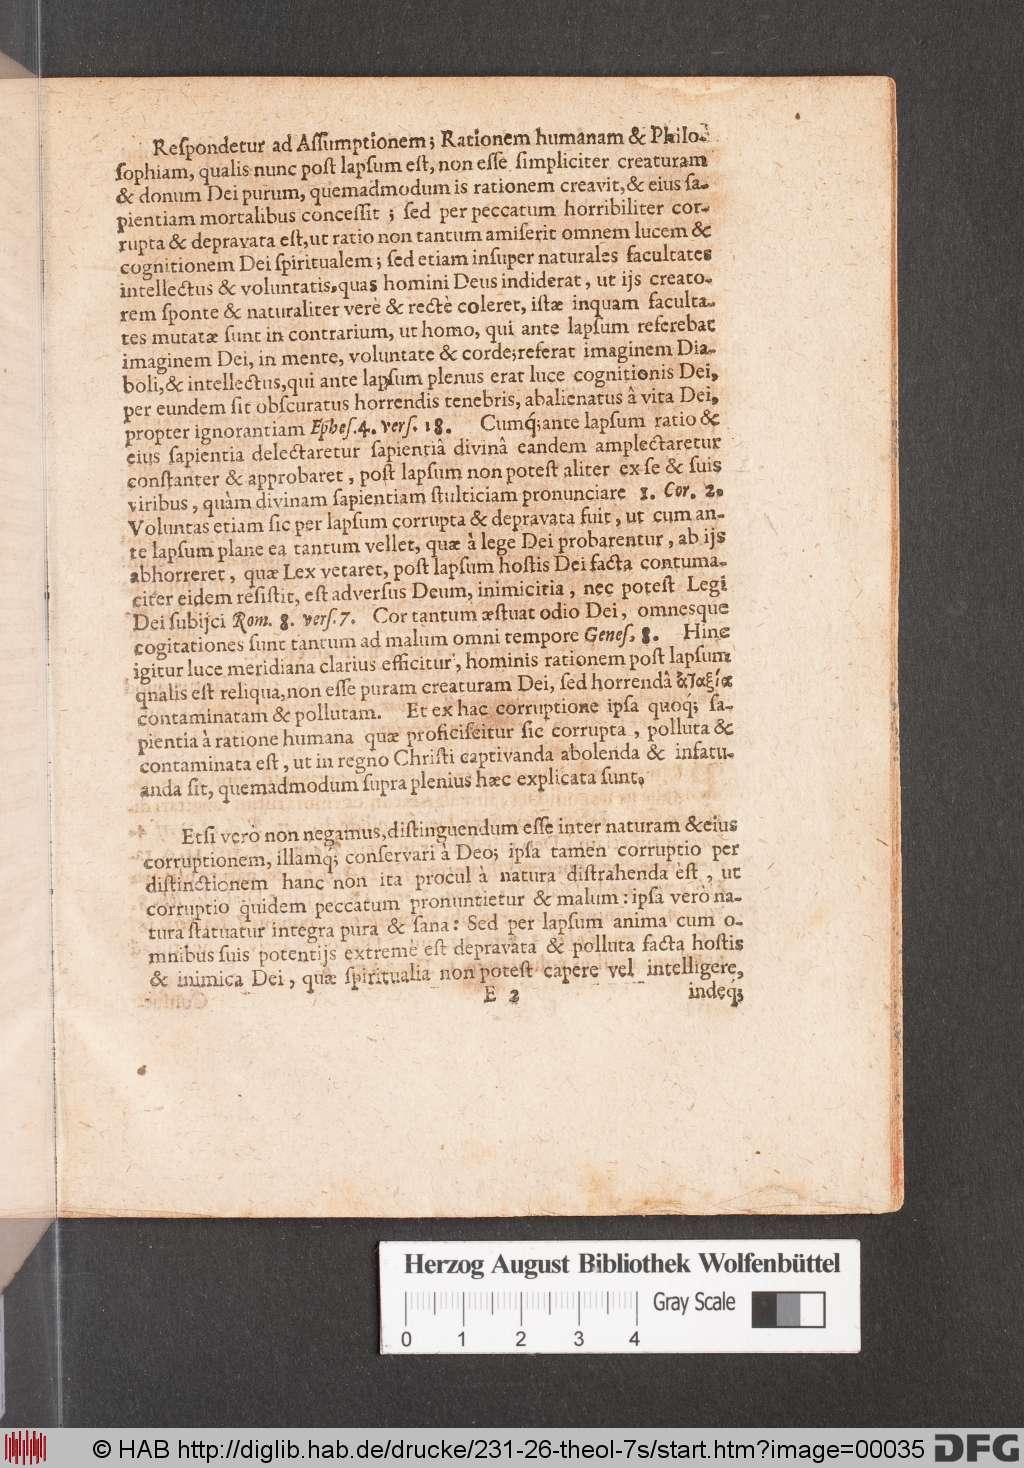 http://diglib.hab.de/drucke/231-26-theol-7s/00035.jpg